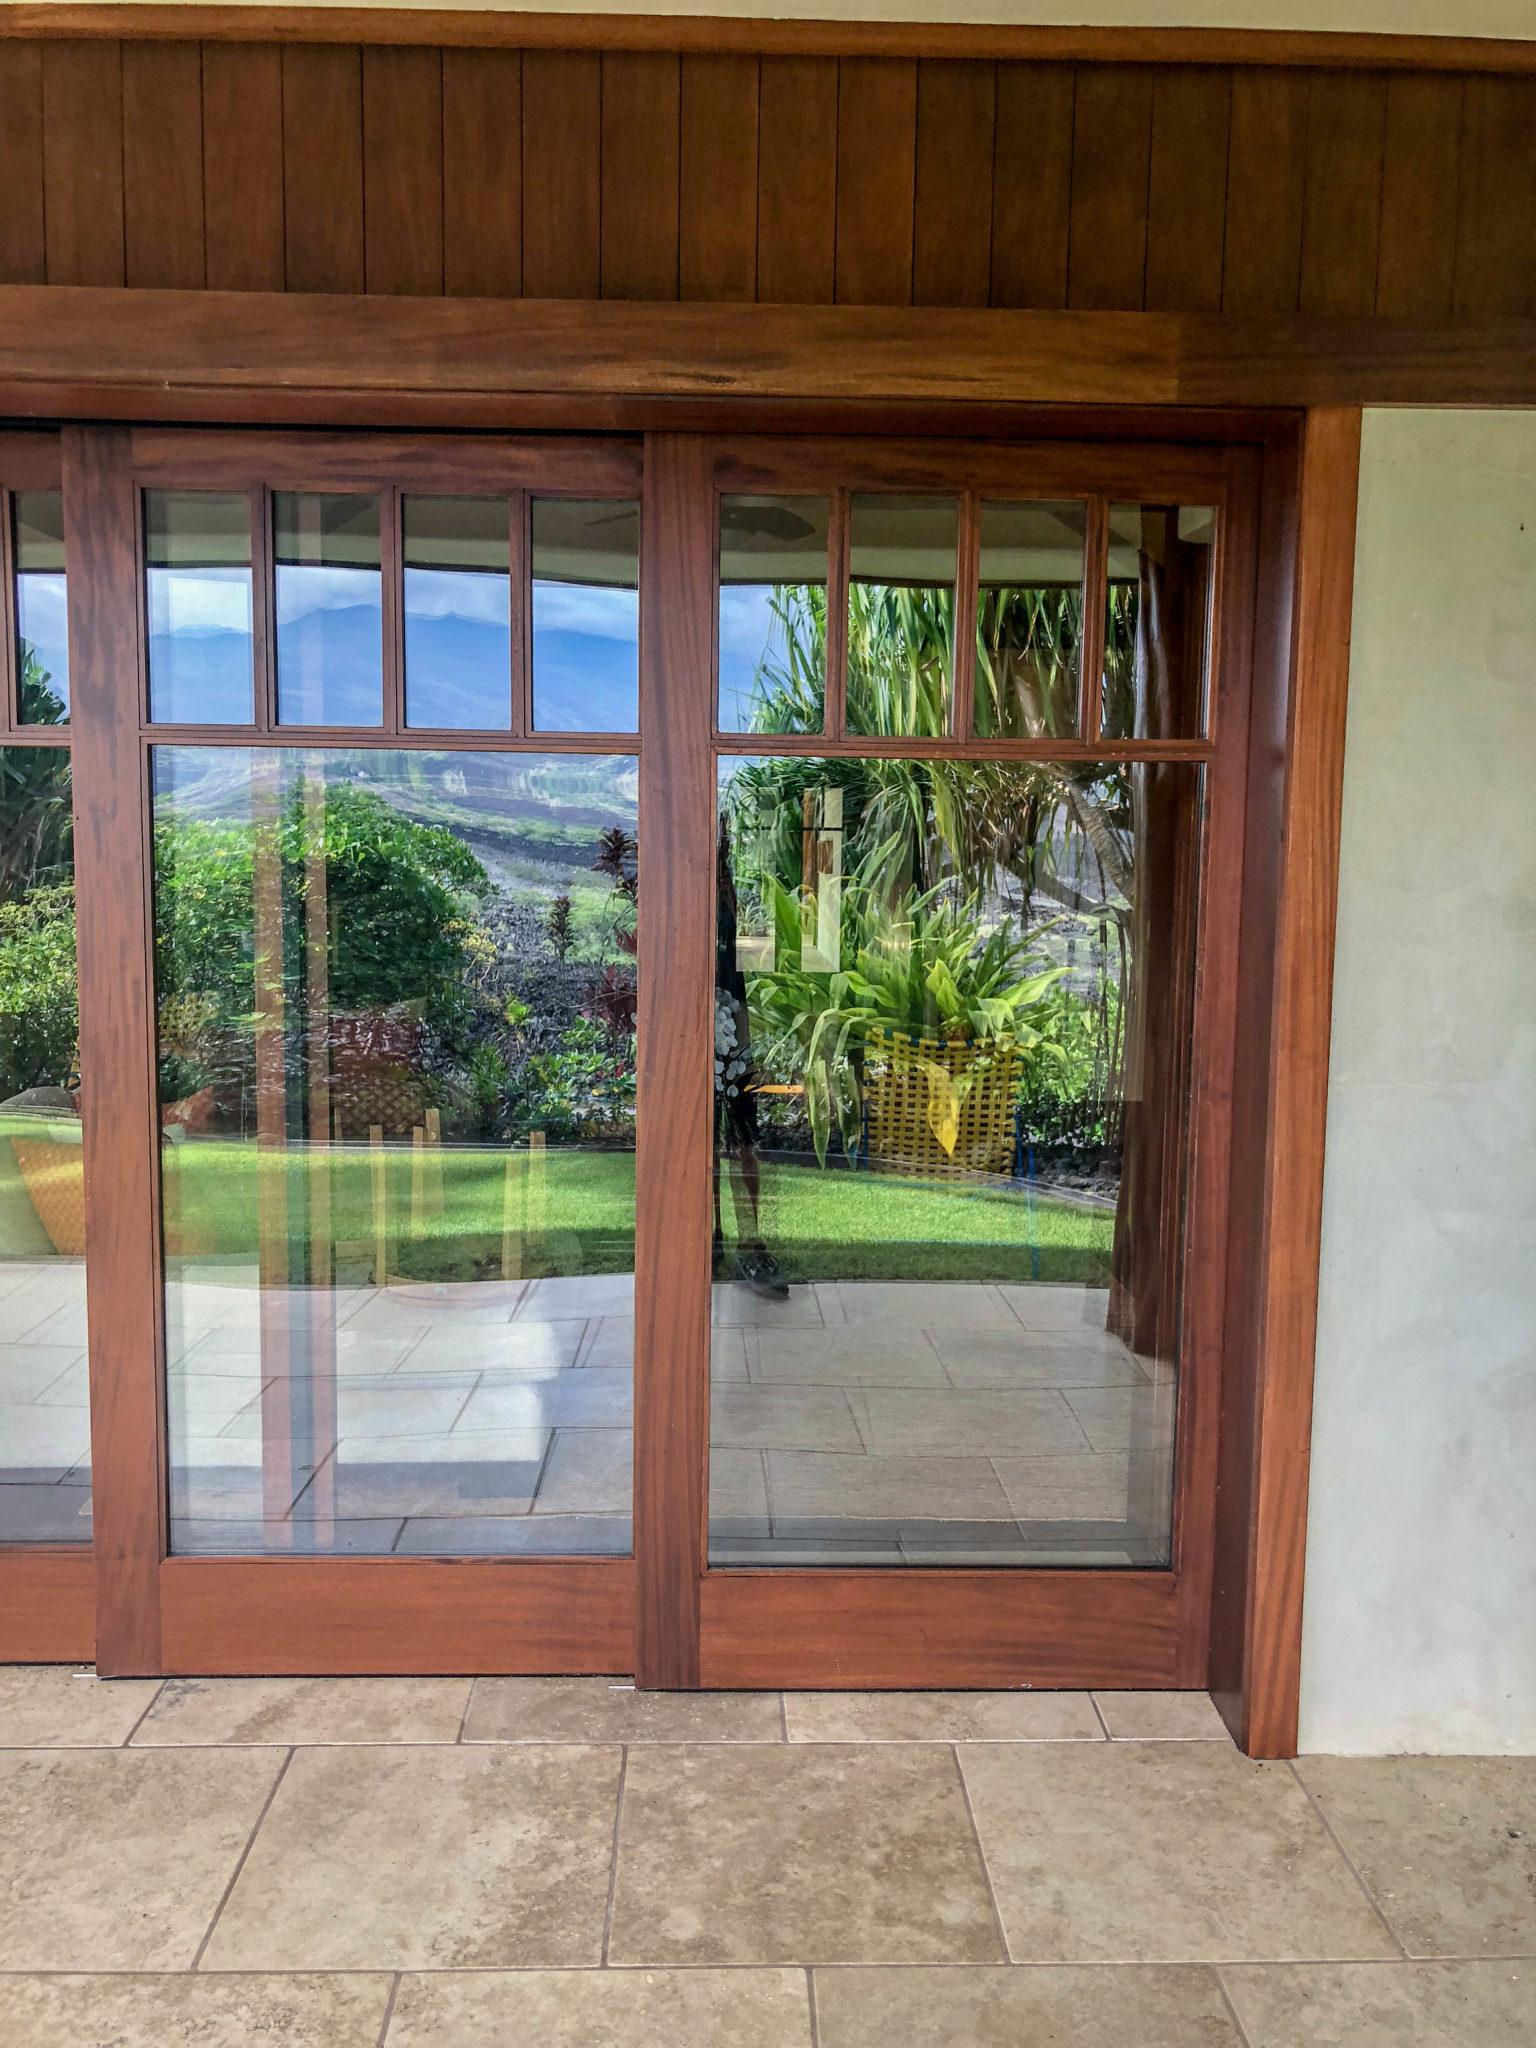 kona glass hawaii - sliding glass doors